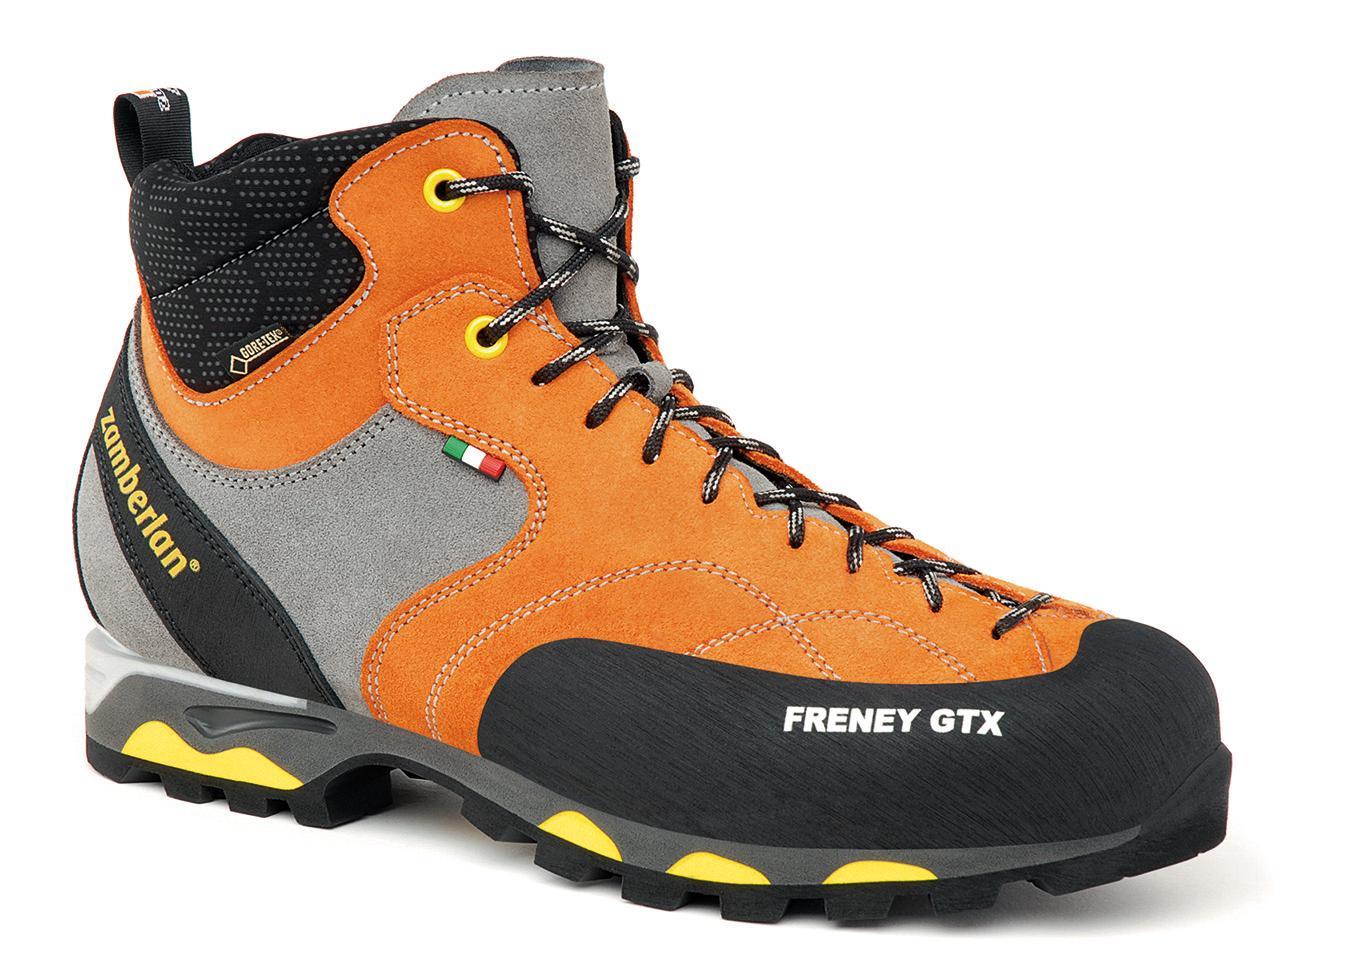 2197 FRENEY GTX RR   -   Scarponi  Alpinismo   -   Orange